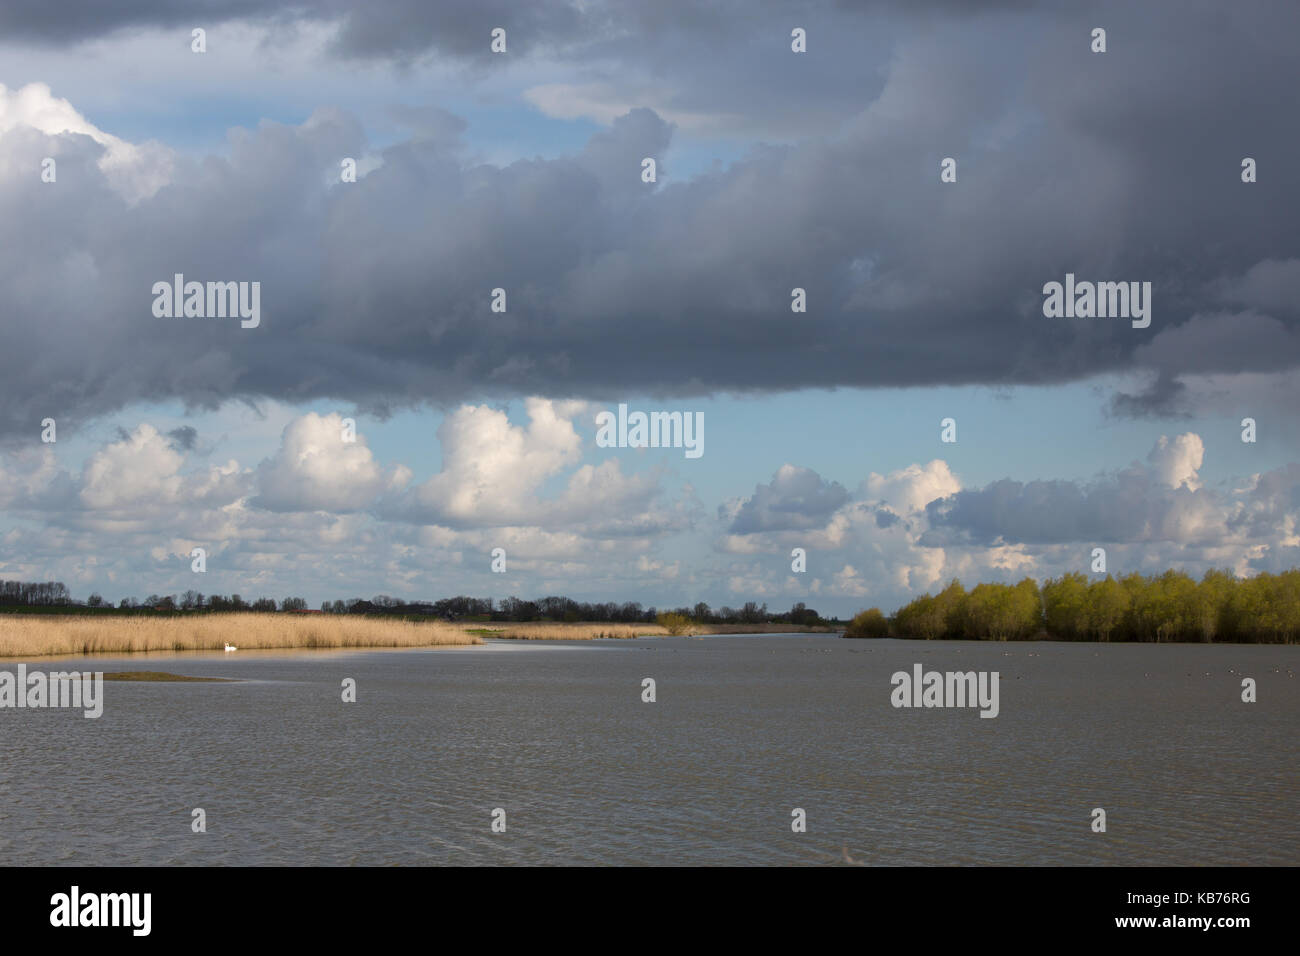 Ezumakeeg with clouds in the sky, The Netherlands, Friesland, Lauwersmeer, Ezumakeeg - Stock Image